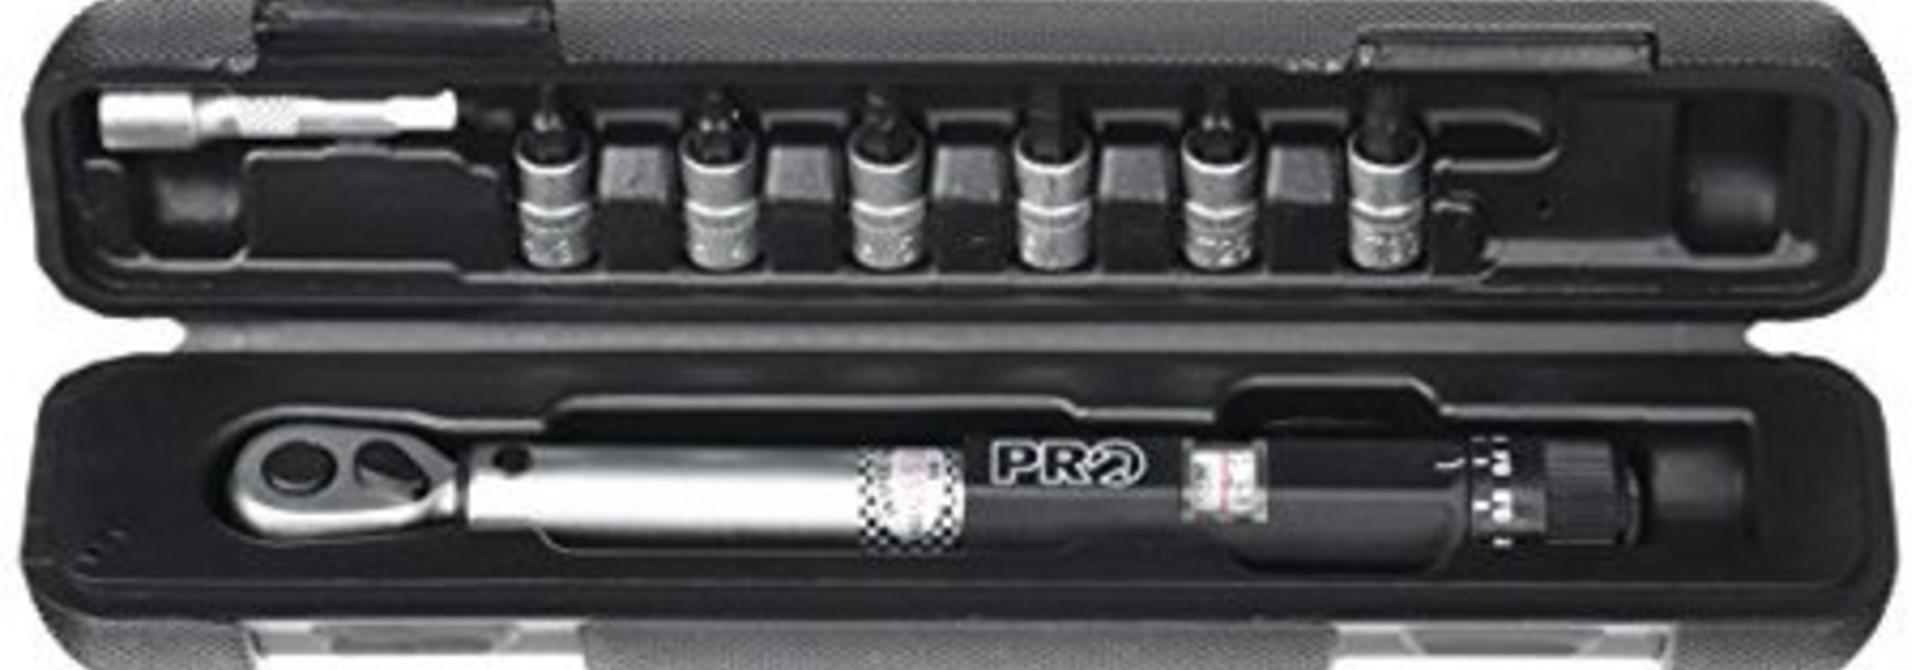 Shimano Tool, Torque Wrench Adjustable 3-15 NM